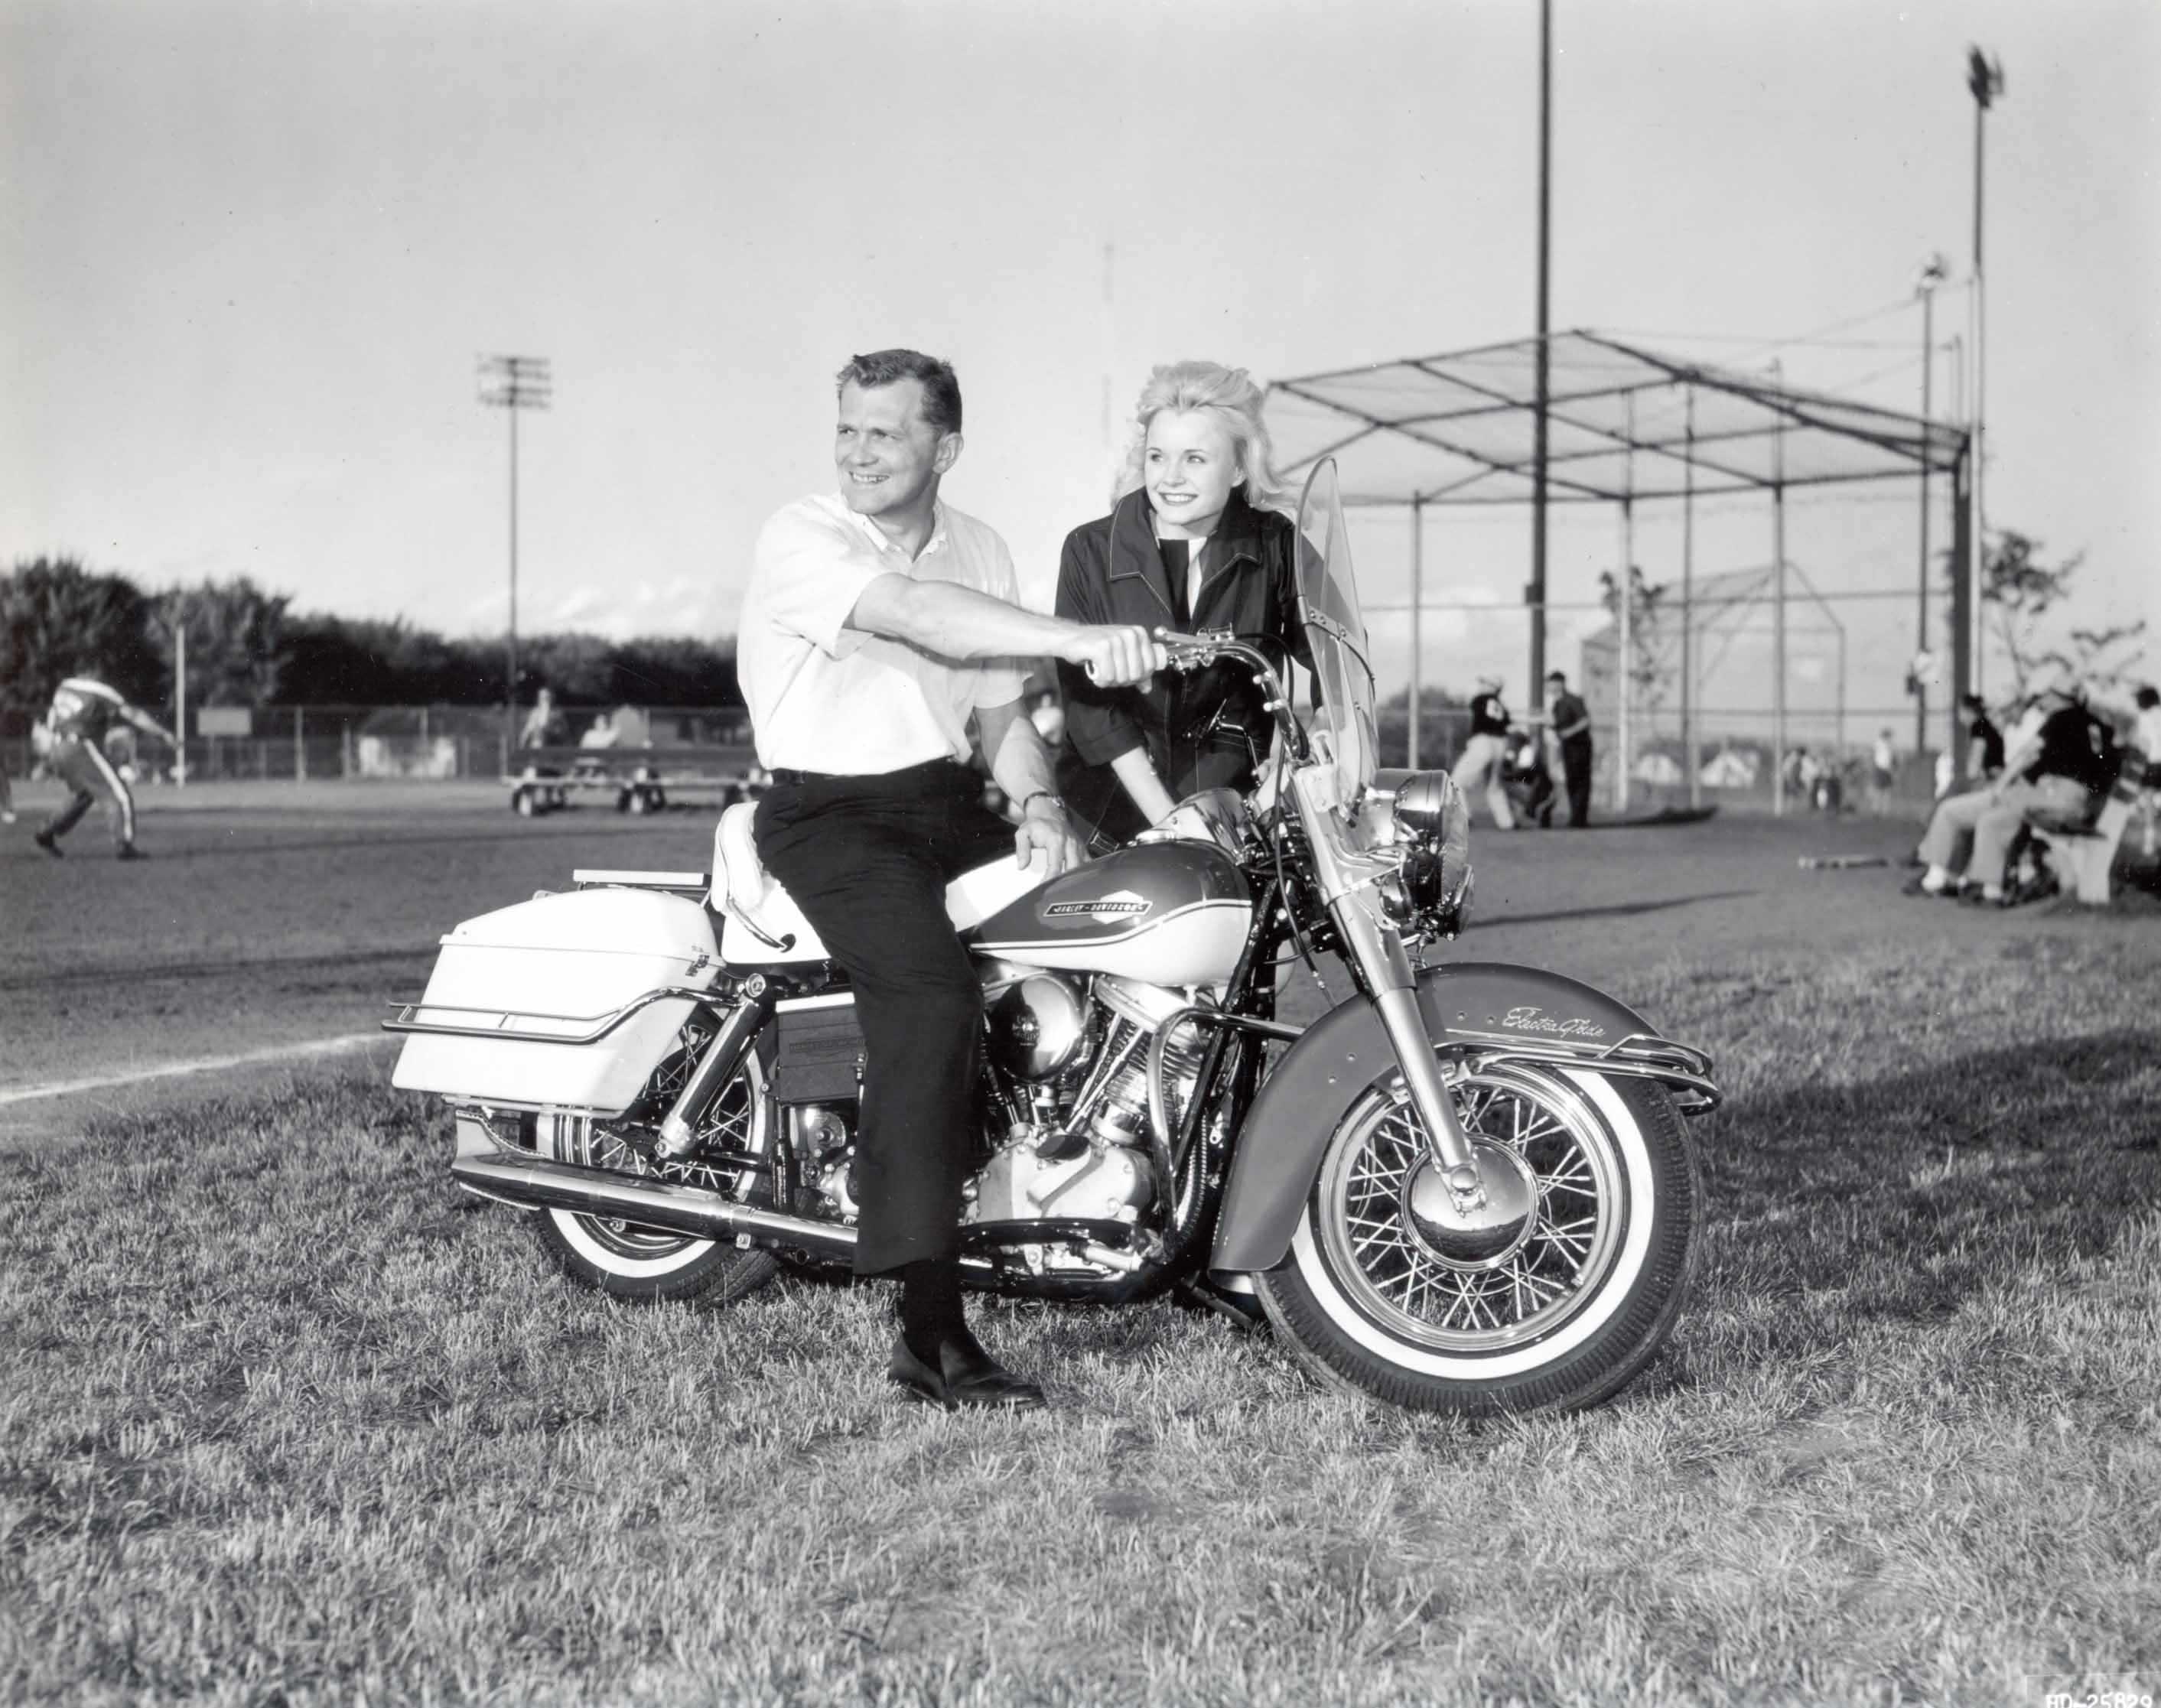 Harley-Davidson Shovelhead V-Twin Motorcycles - HISTORY OF THE BIG